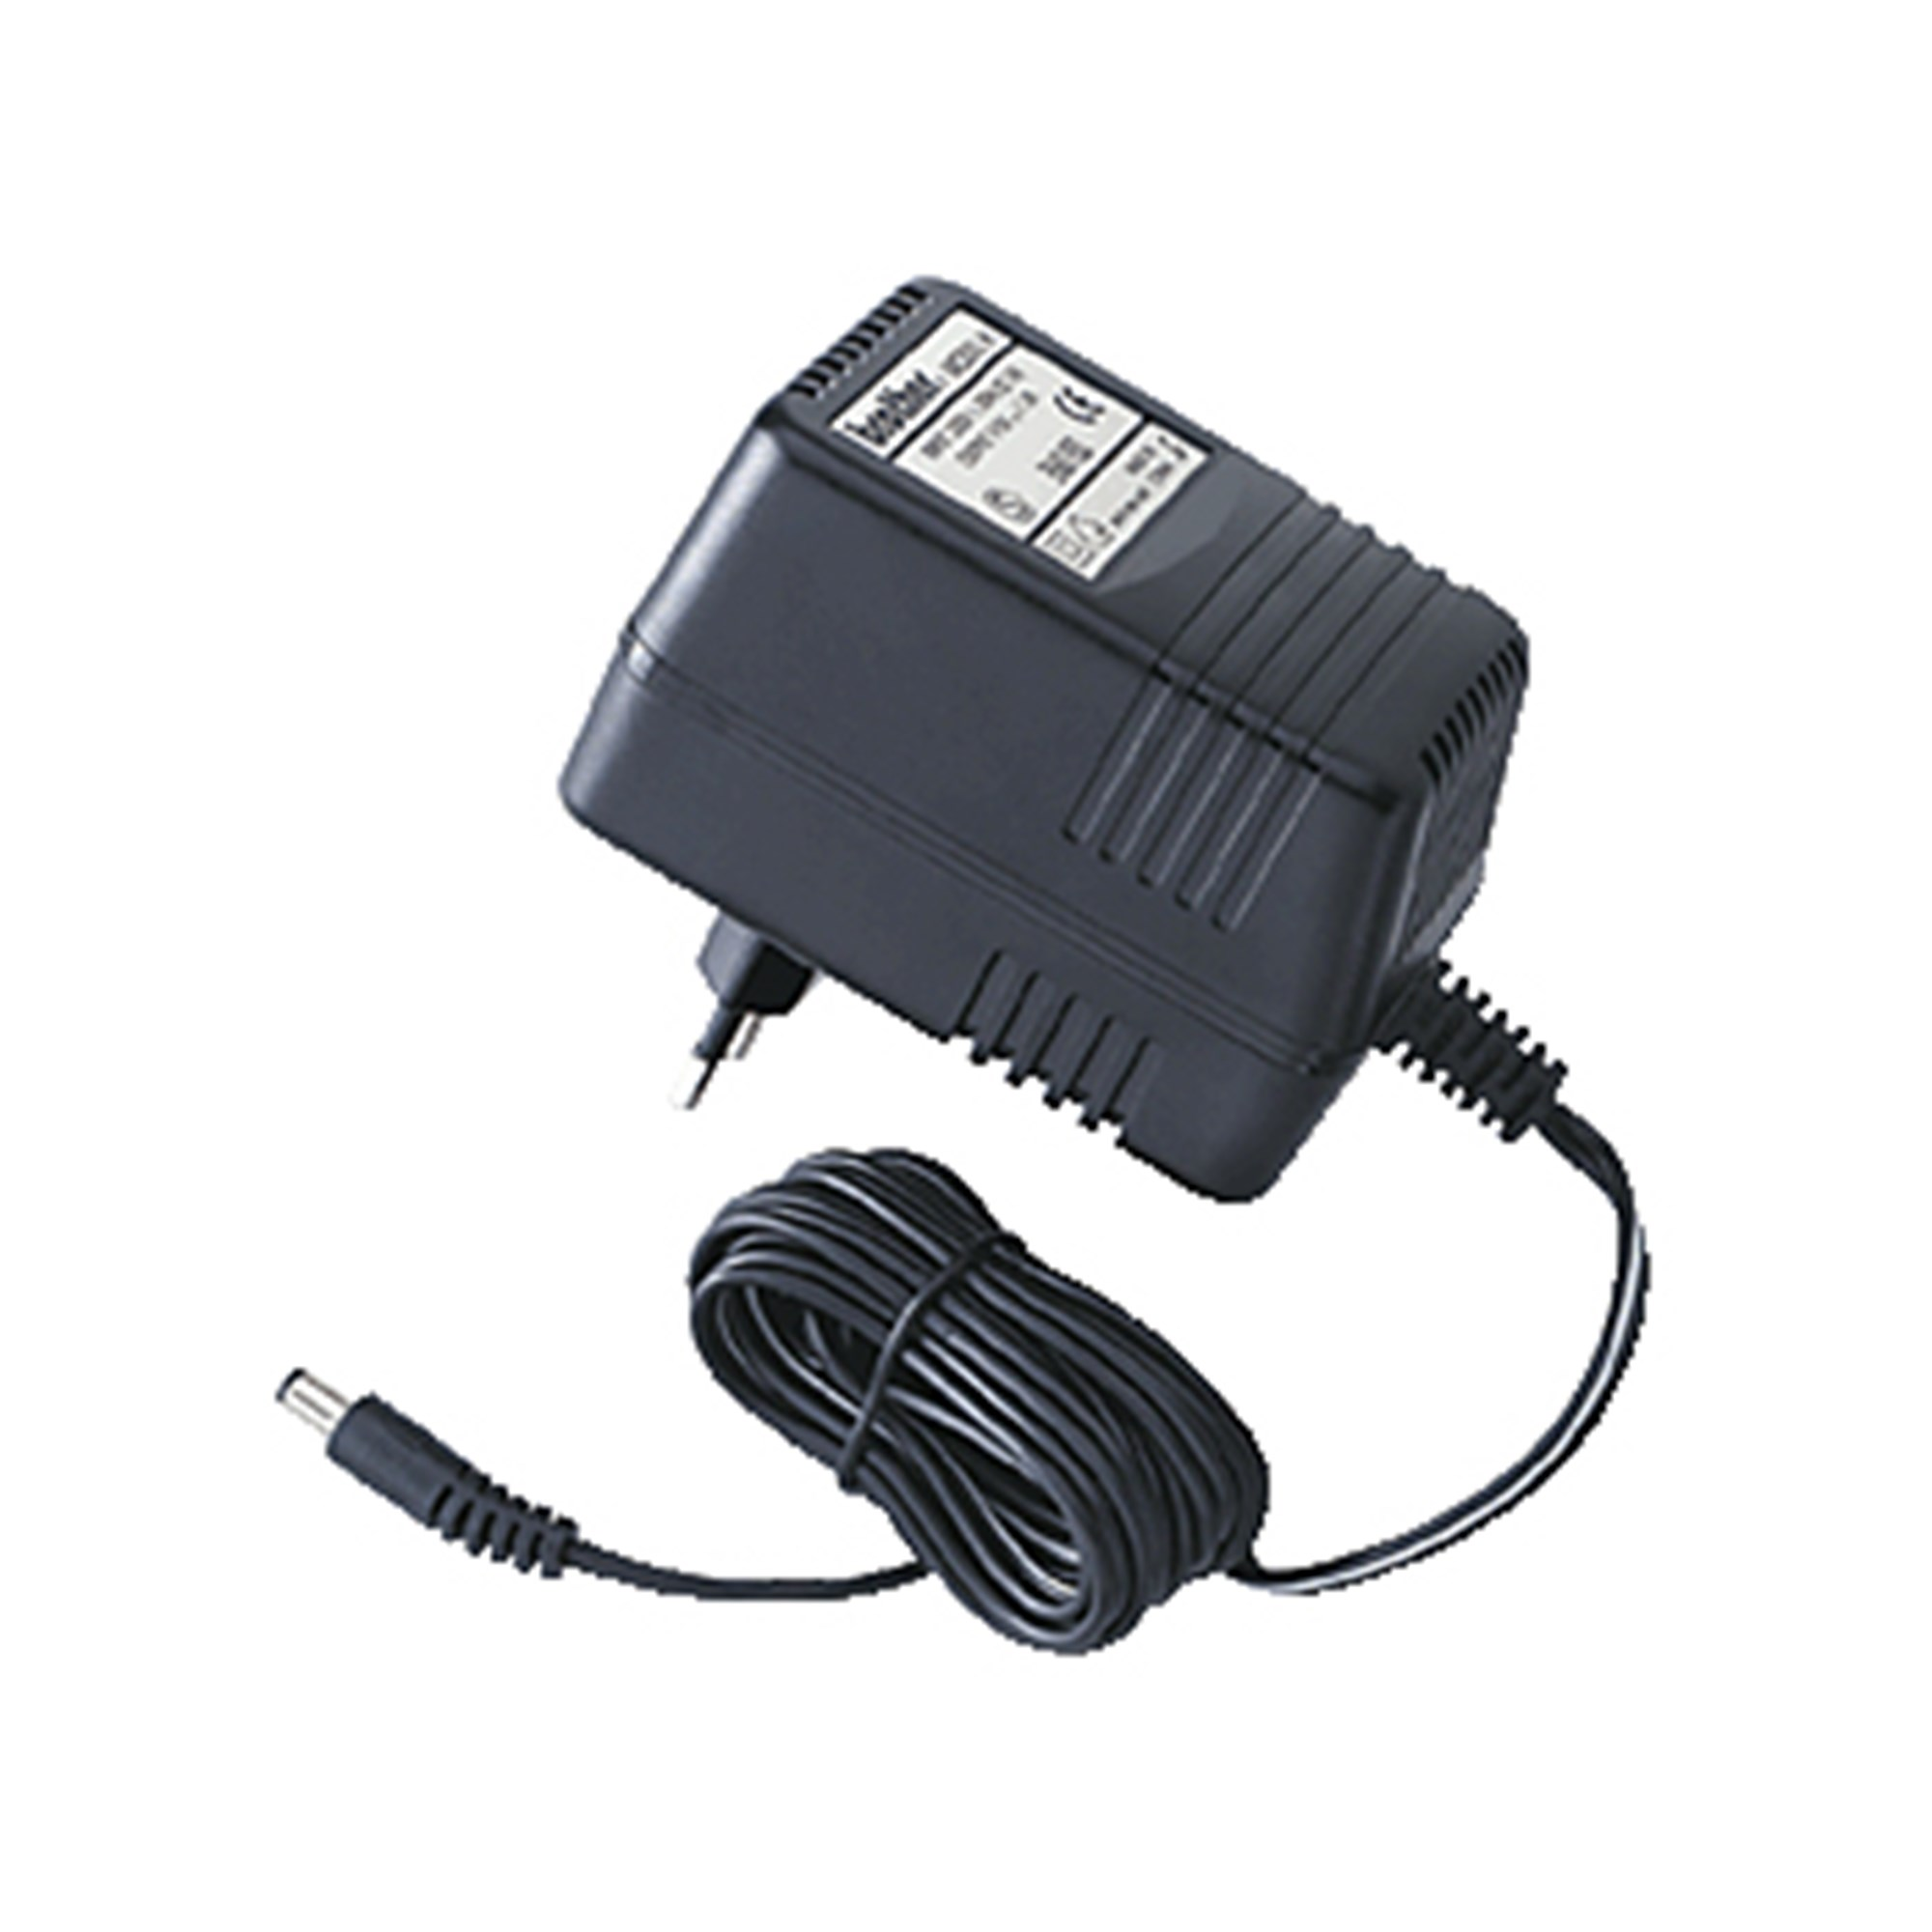 Billede af Adapter for P-Touch printers